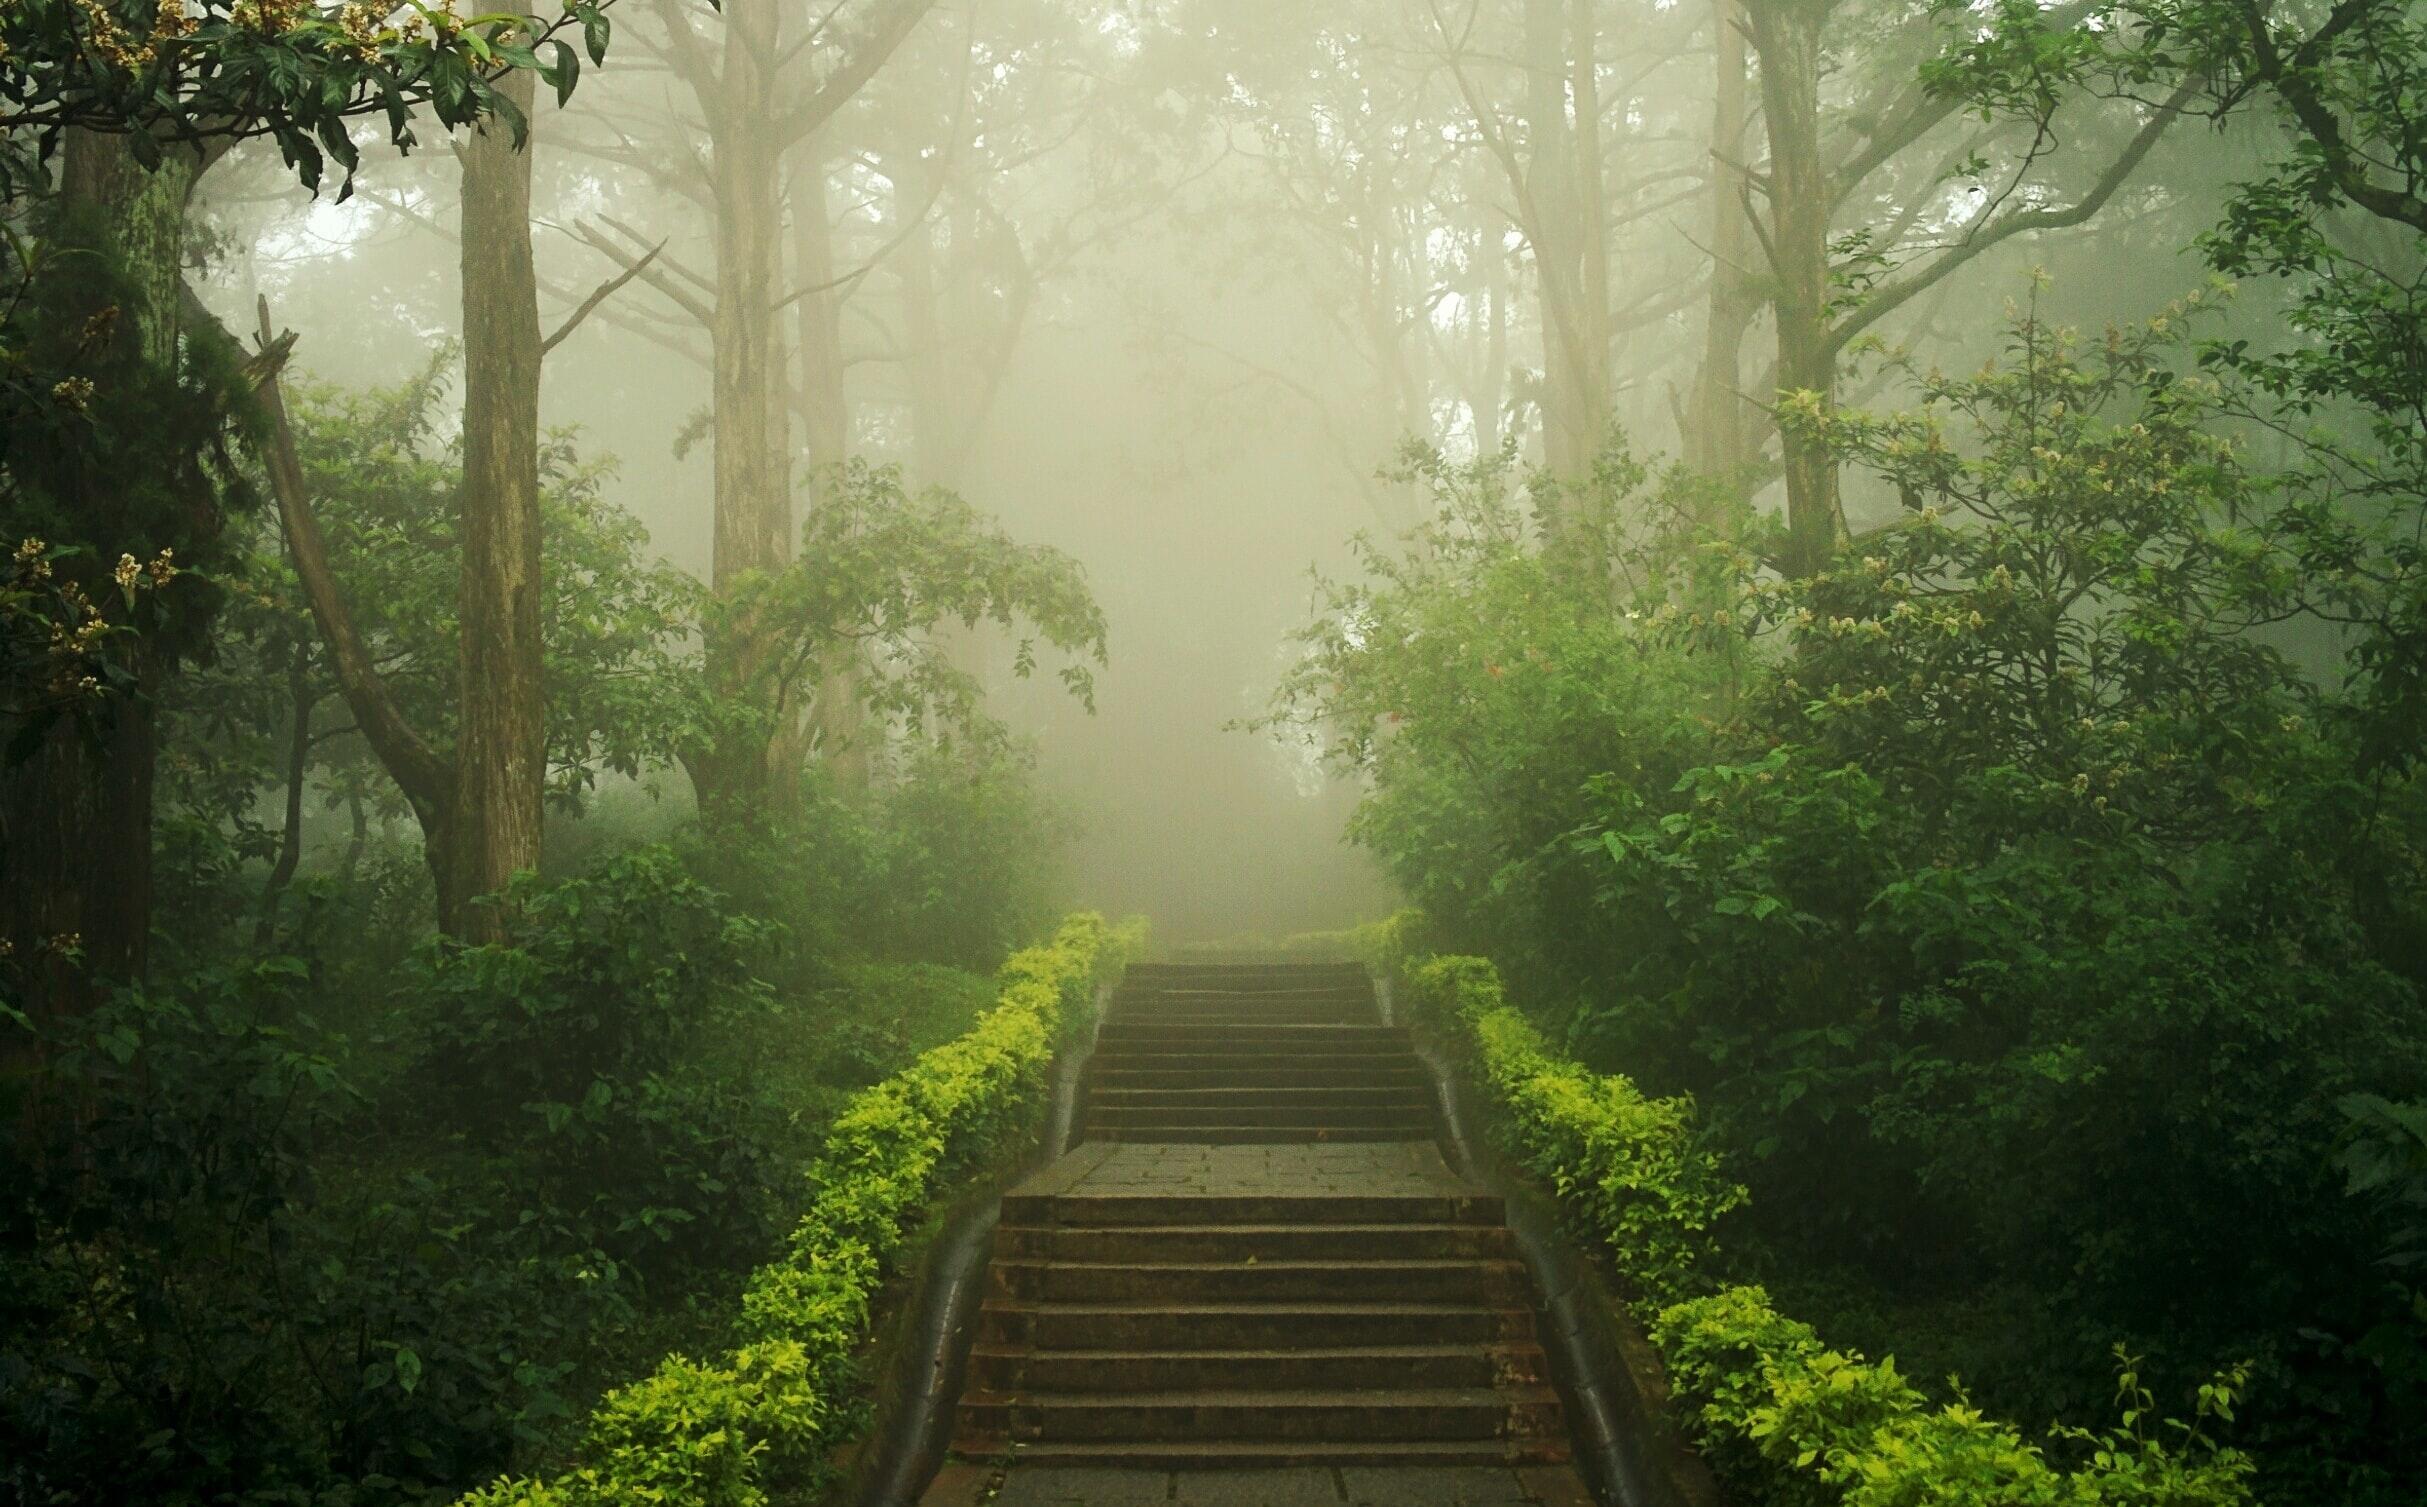 image - simple steps on a foggy path